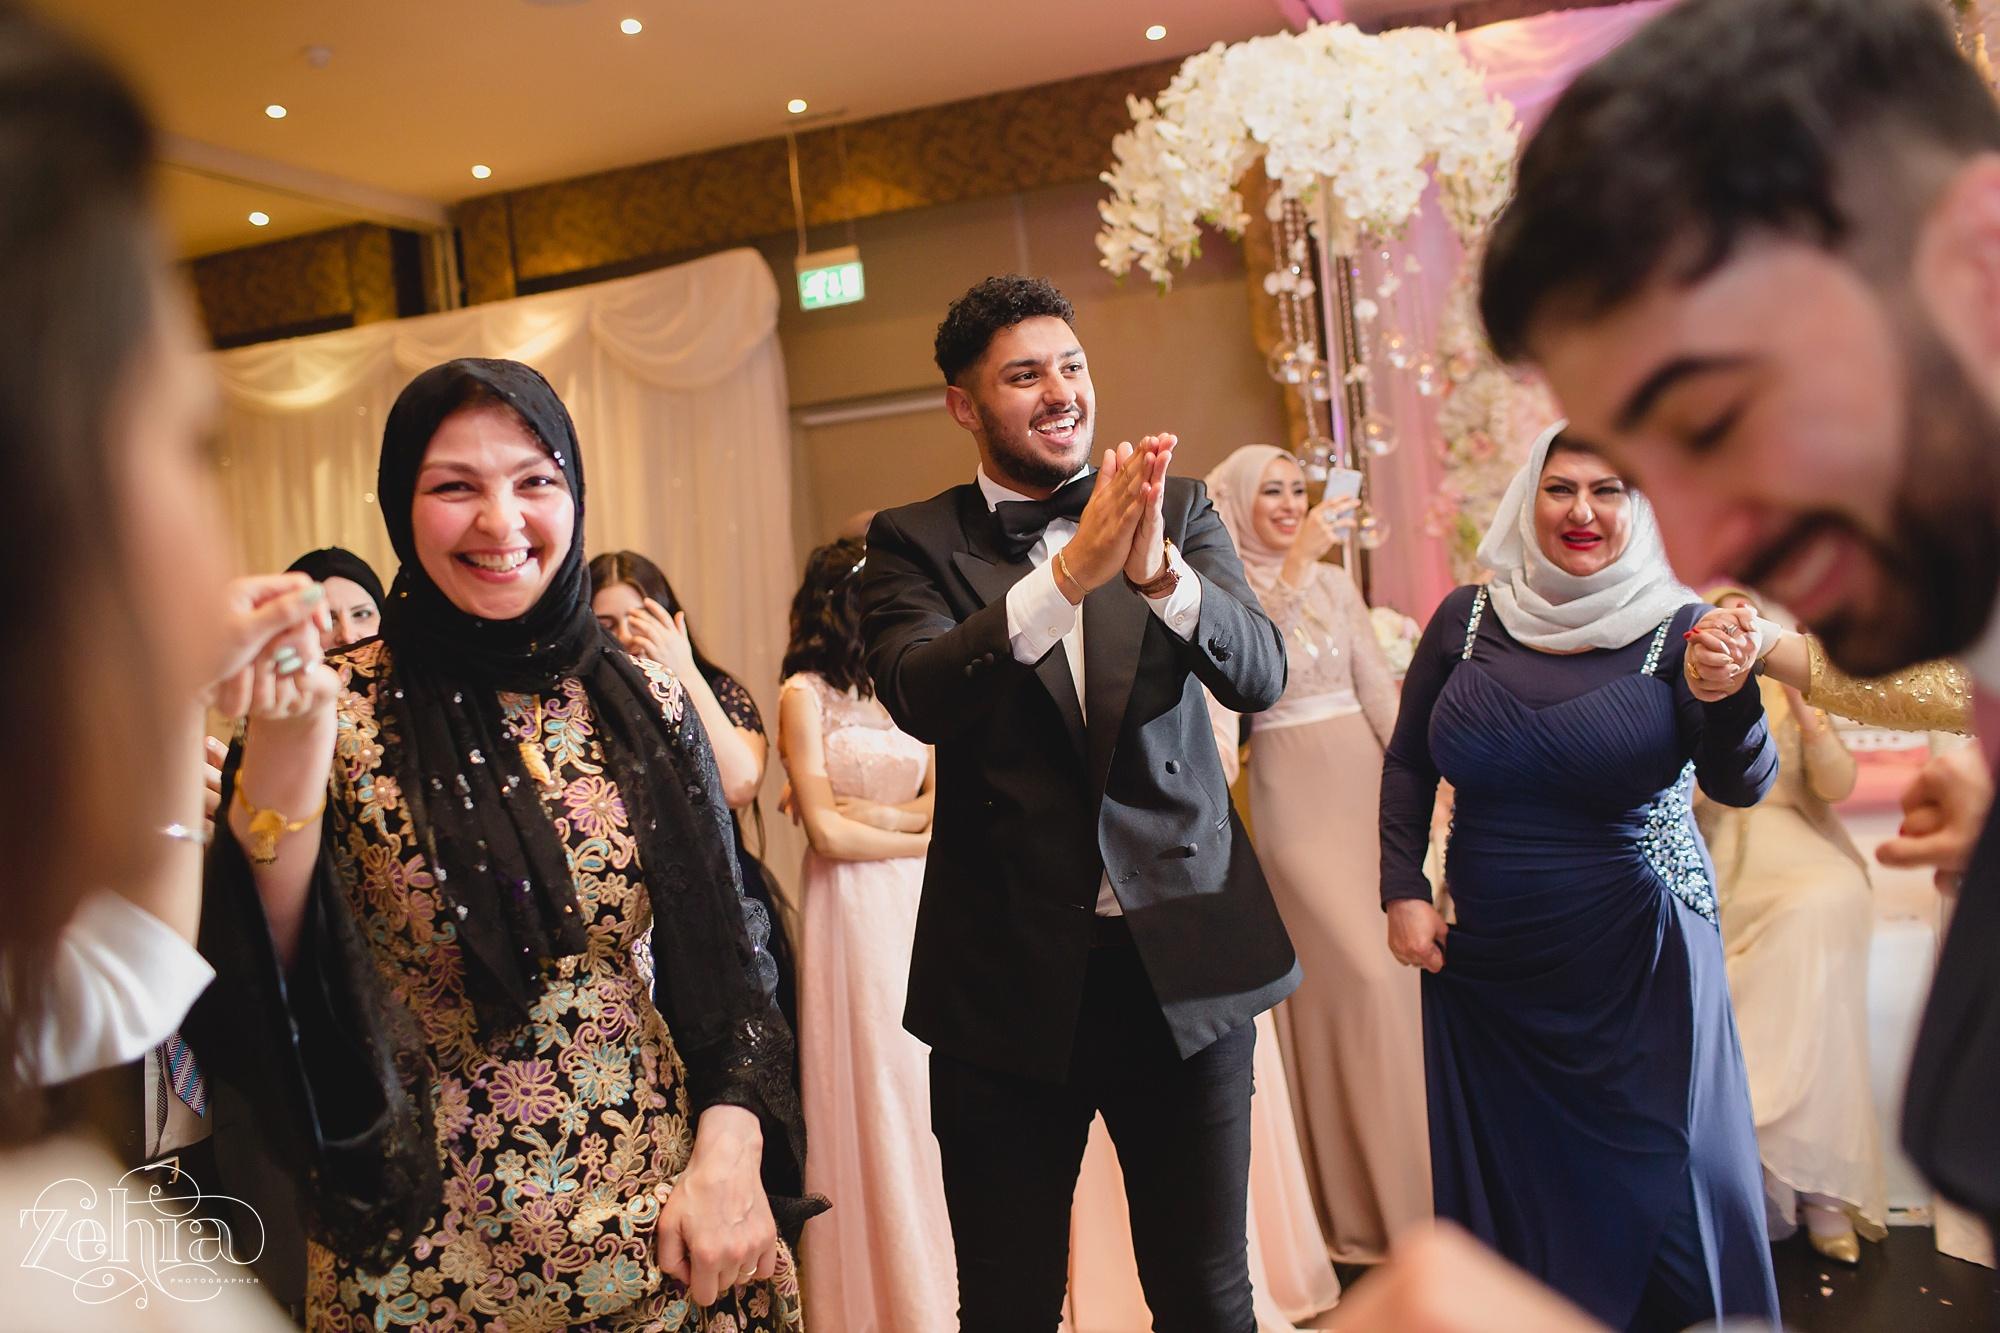 zehra photographer mere cheshire wedding_0065.jpg